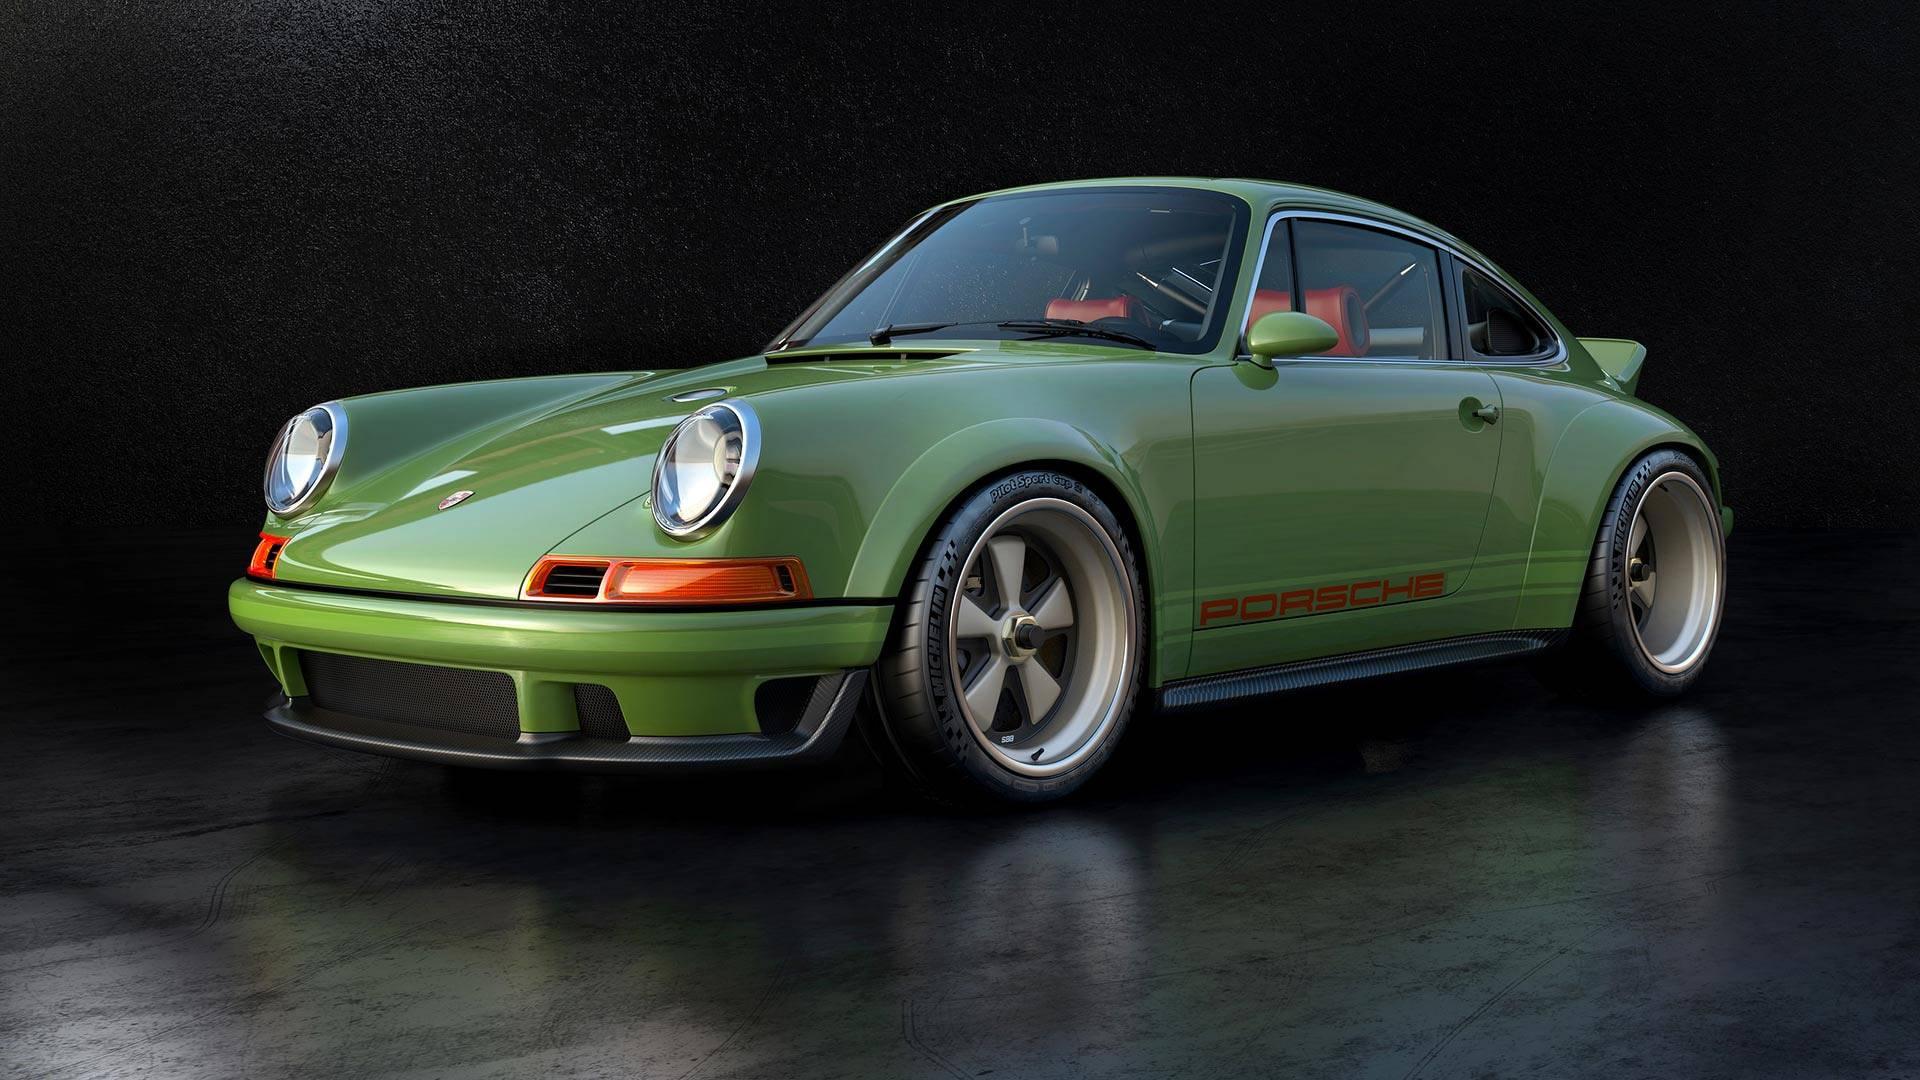 Porsche 911 DSL Singer